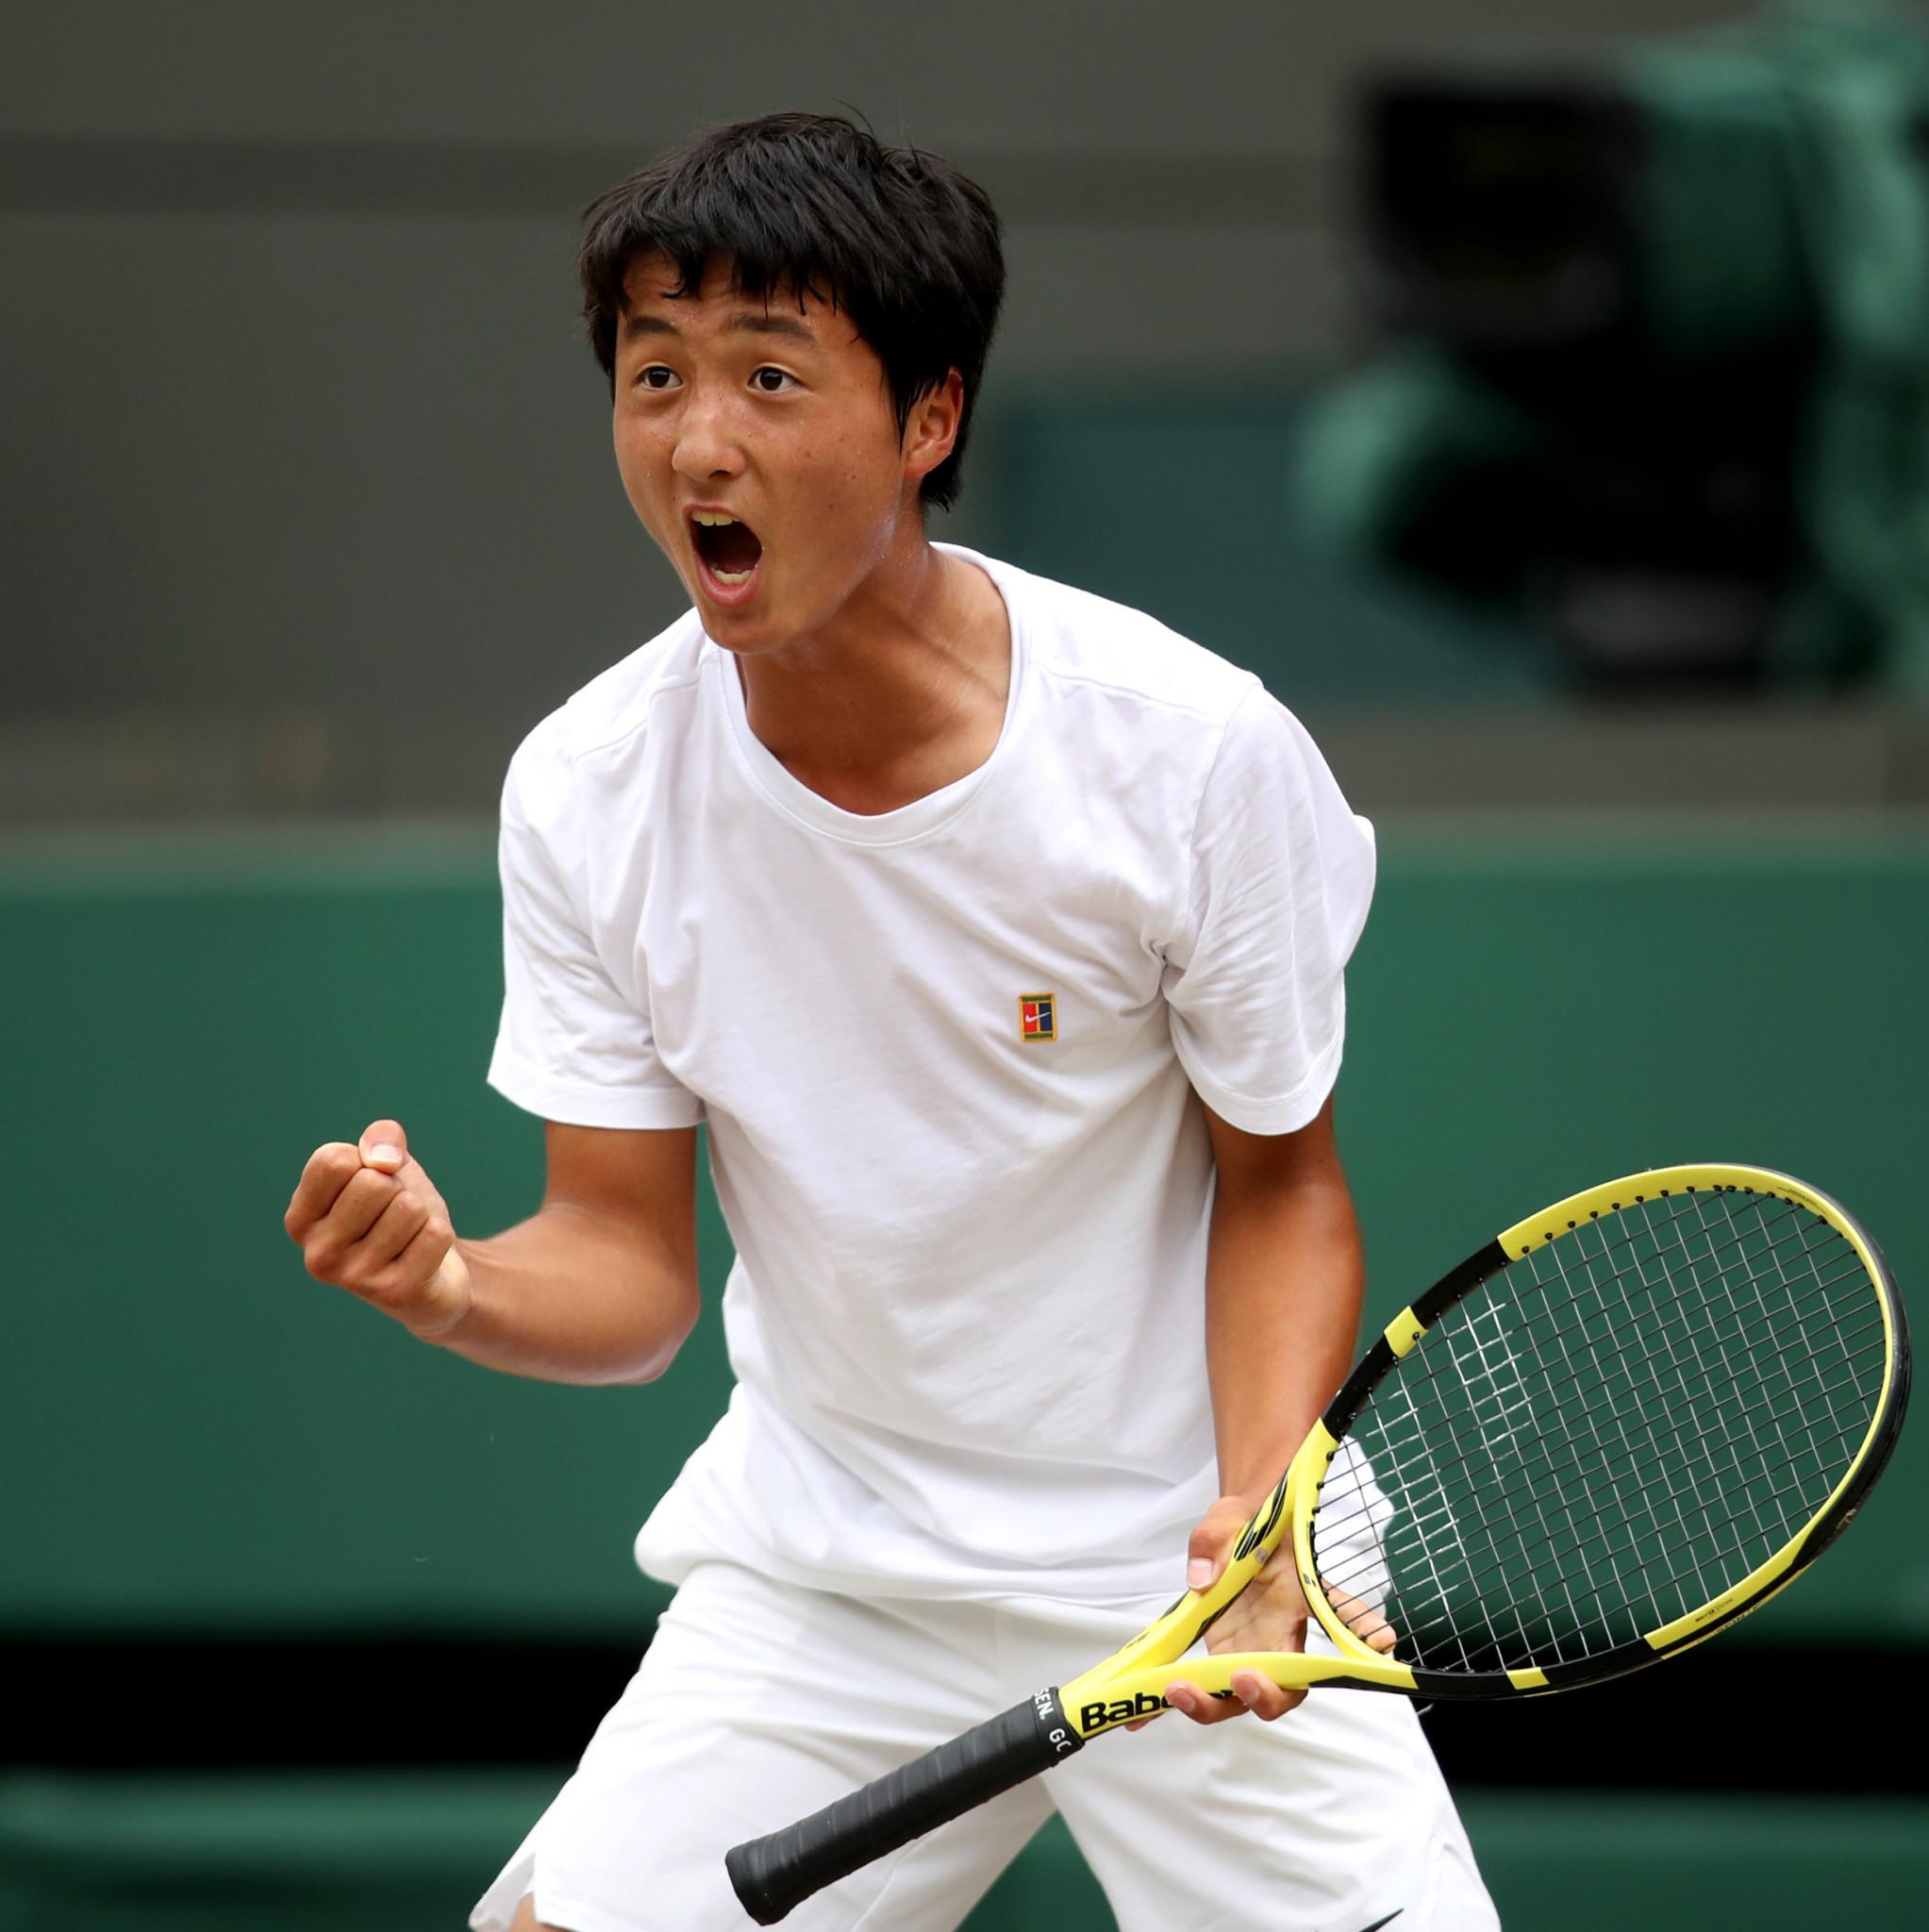 Junior Wimbledon champion Mochizuki to make Davis Cup debut for Japan